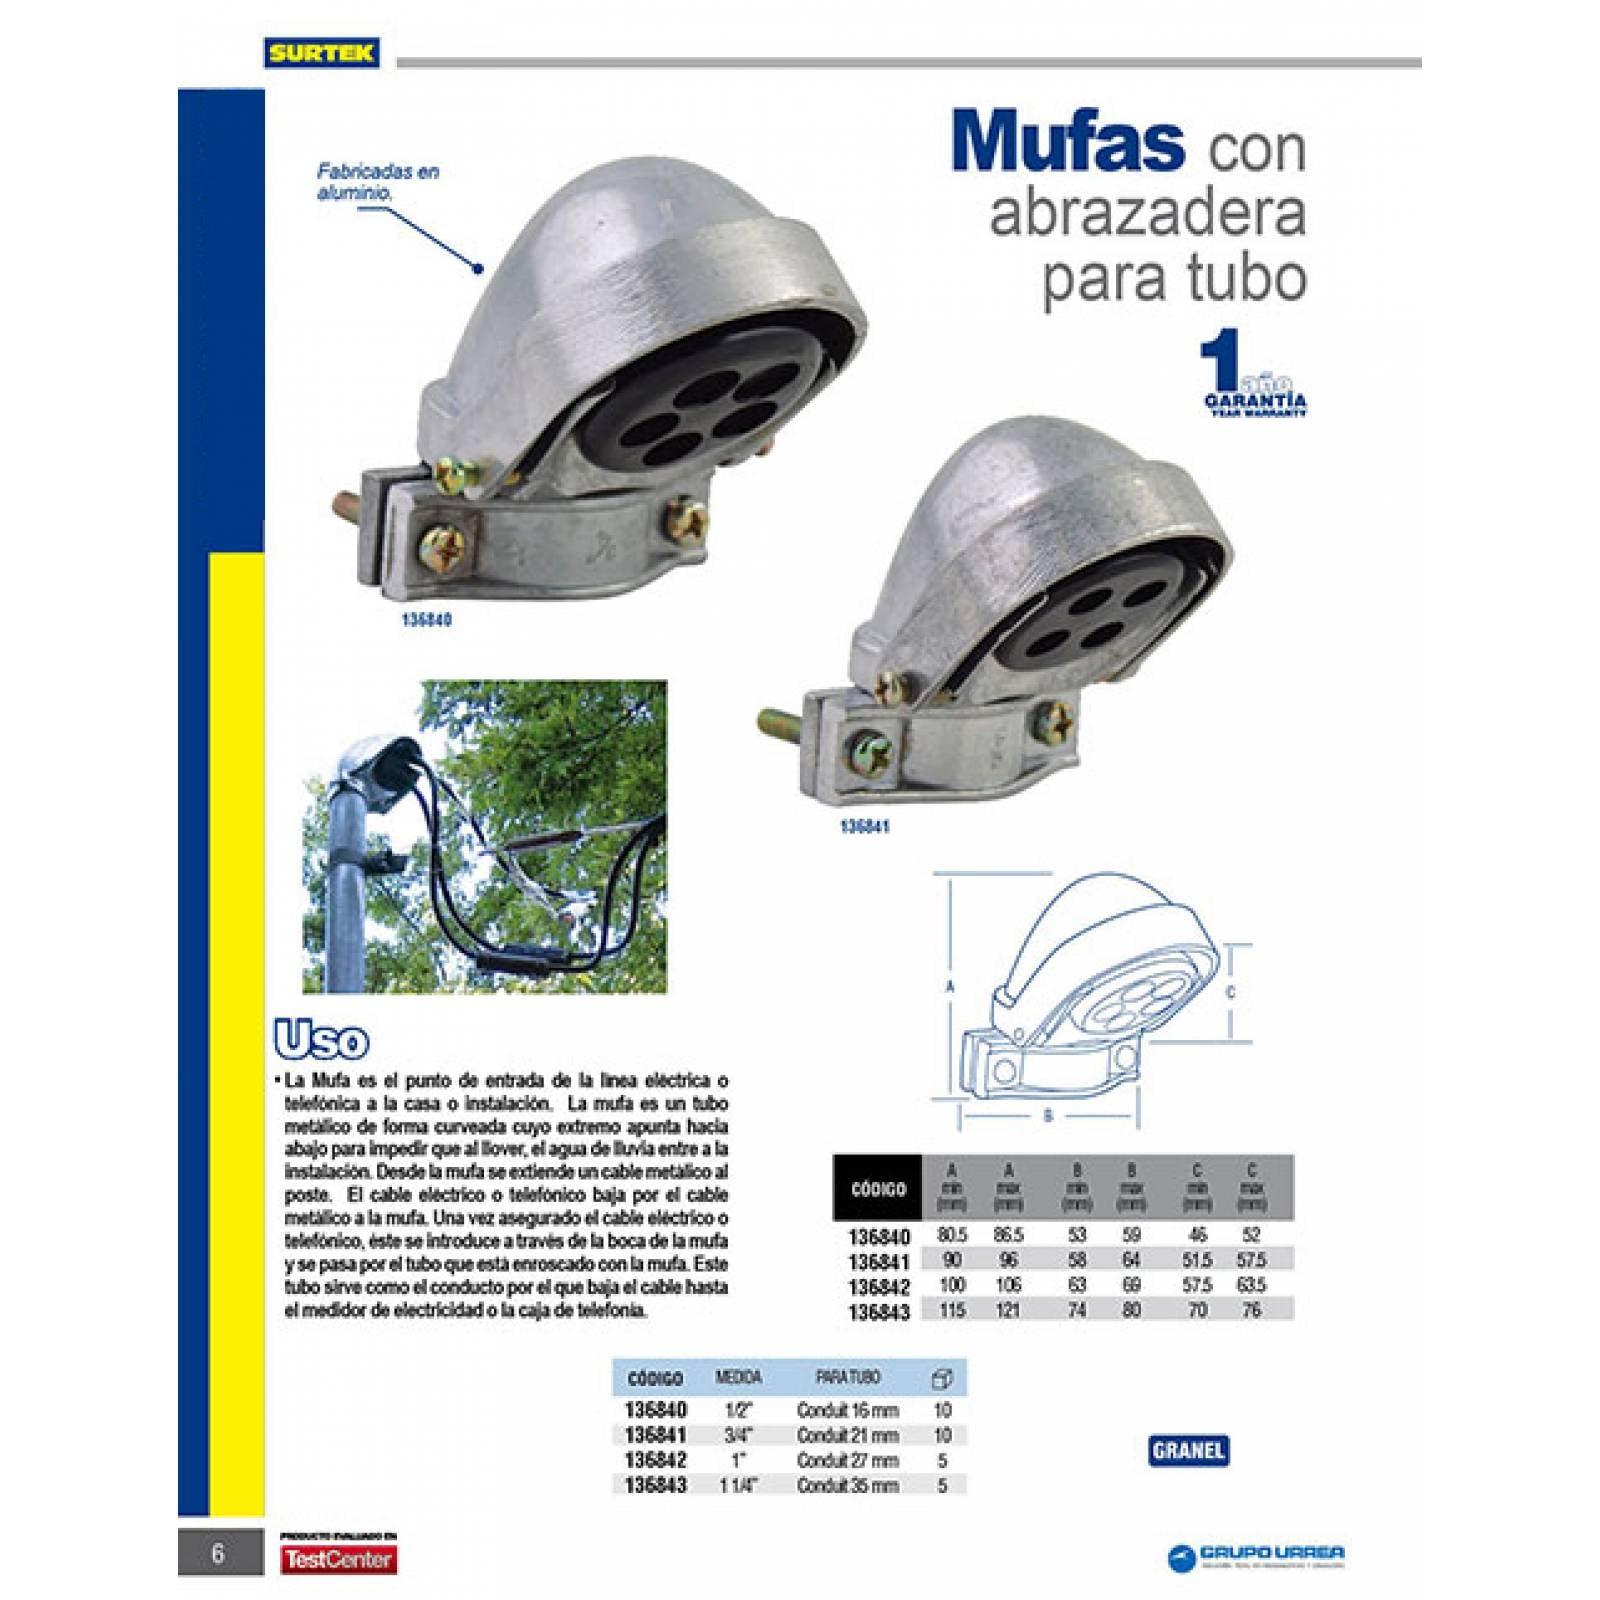 "Mufa Para Intemperie 3/4"" Con Abrazadera 136841 Surtek"